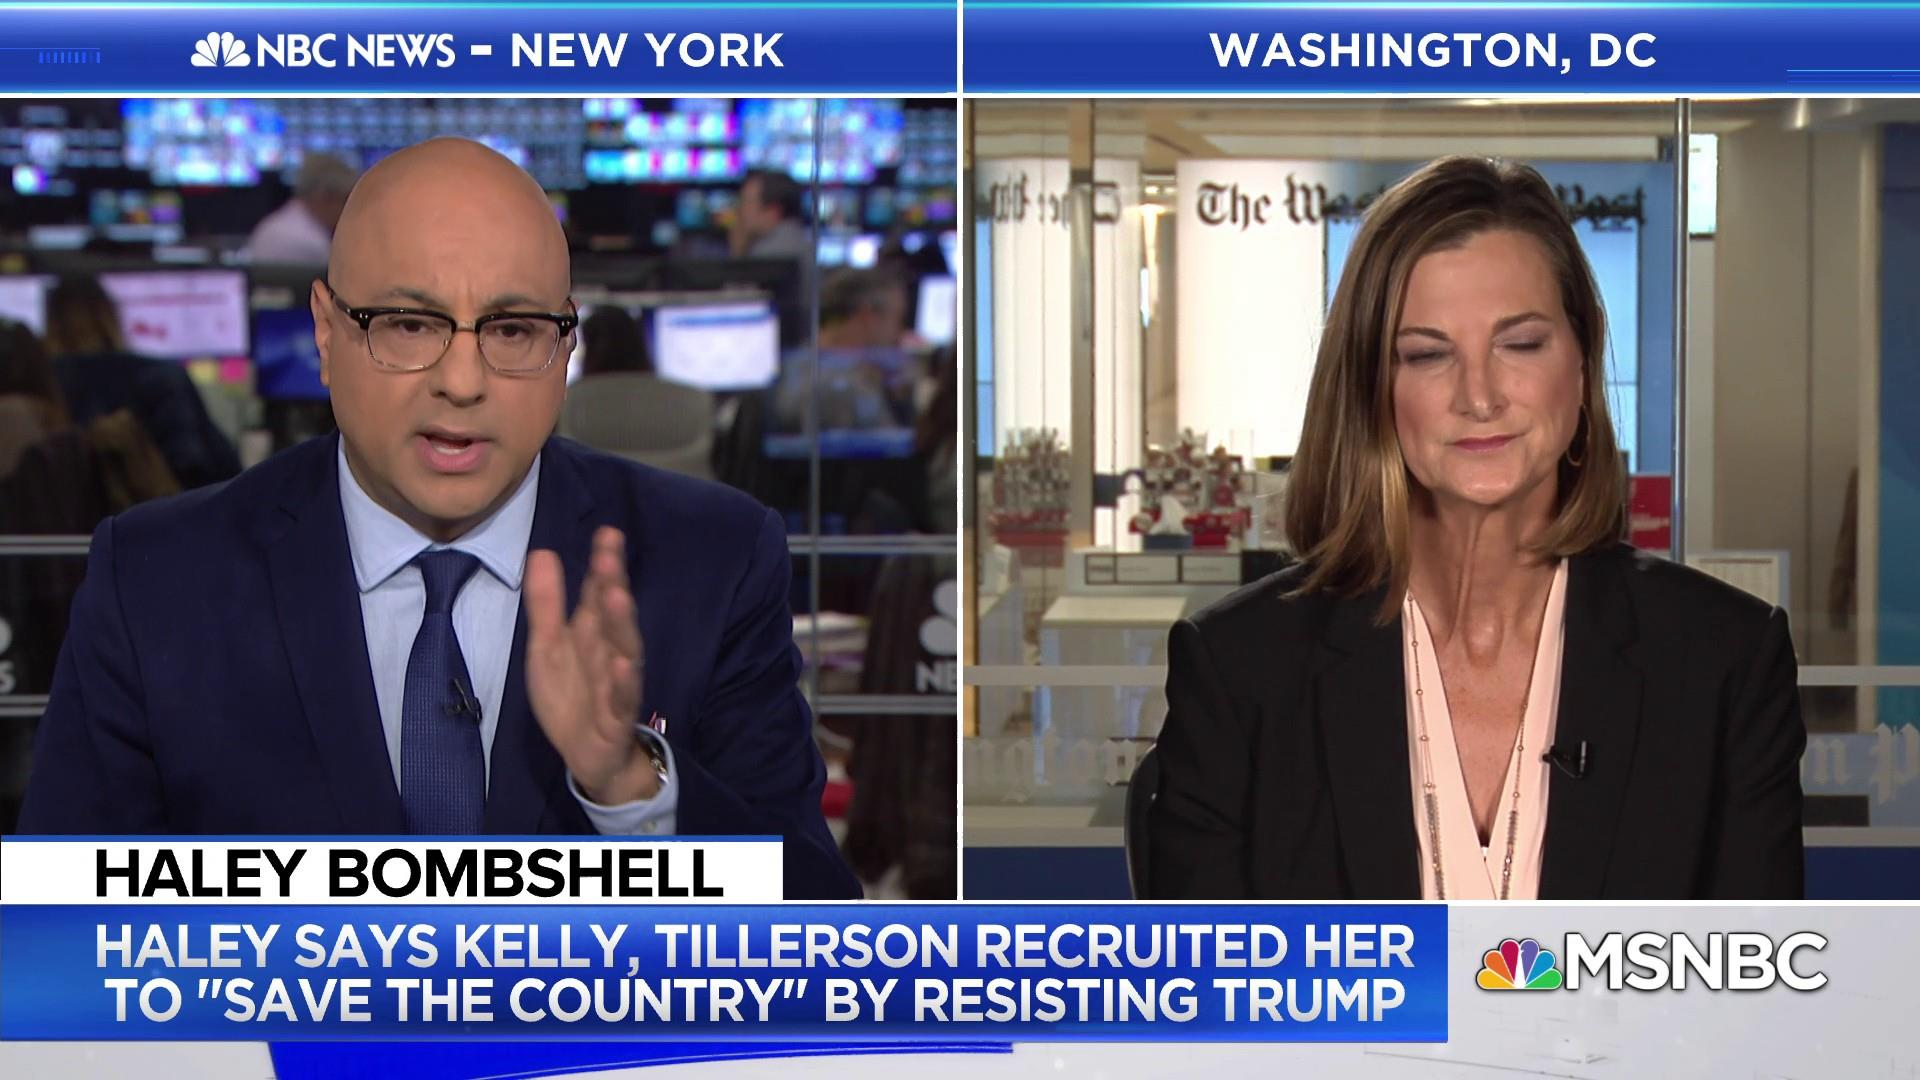 Reporter: Nikki Haley hitching herself to Trump's wagon